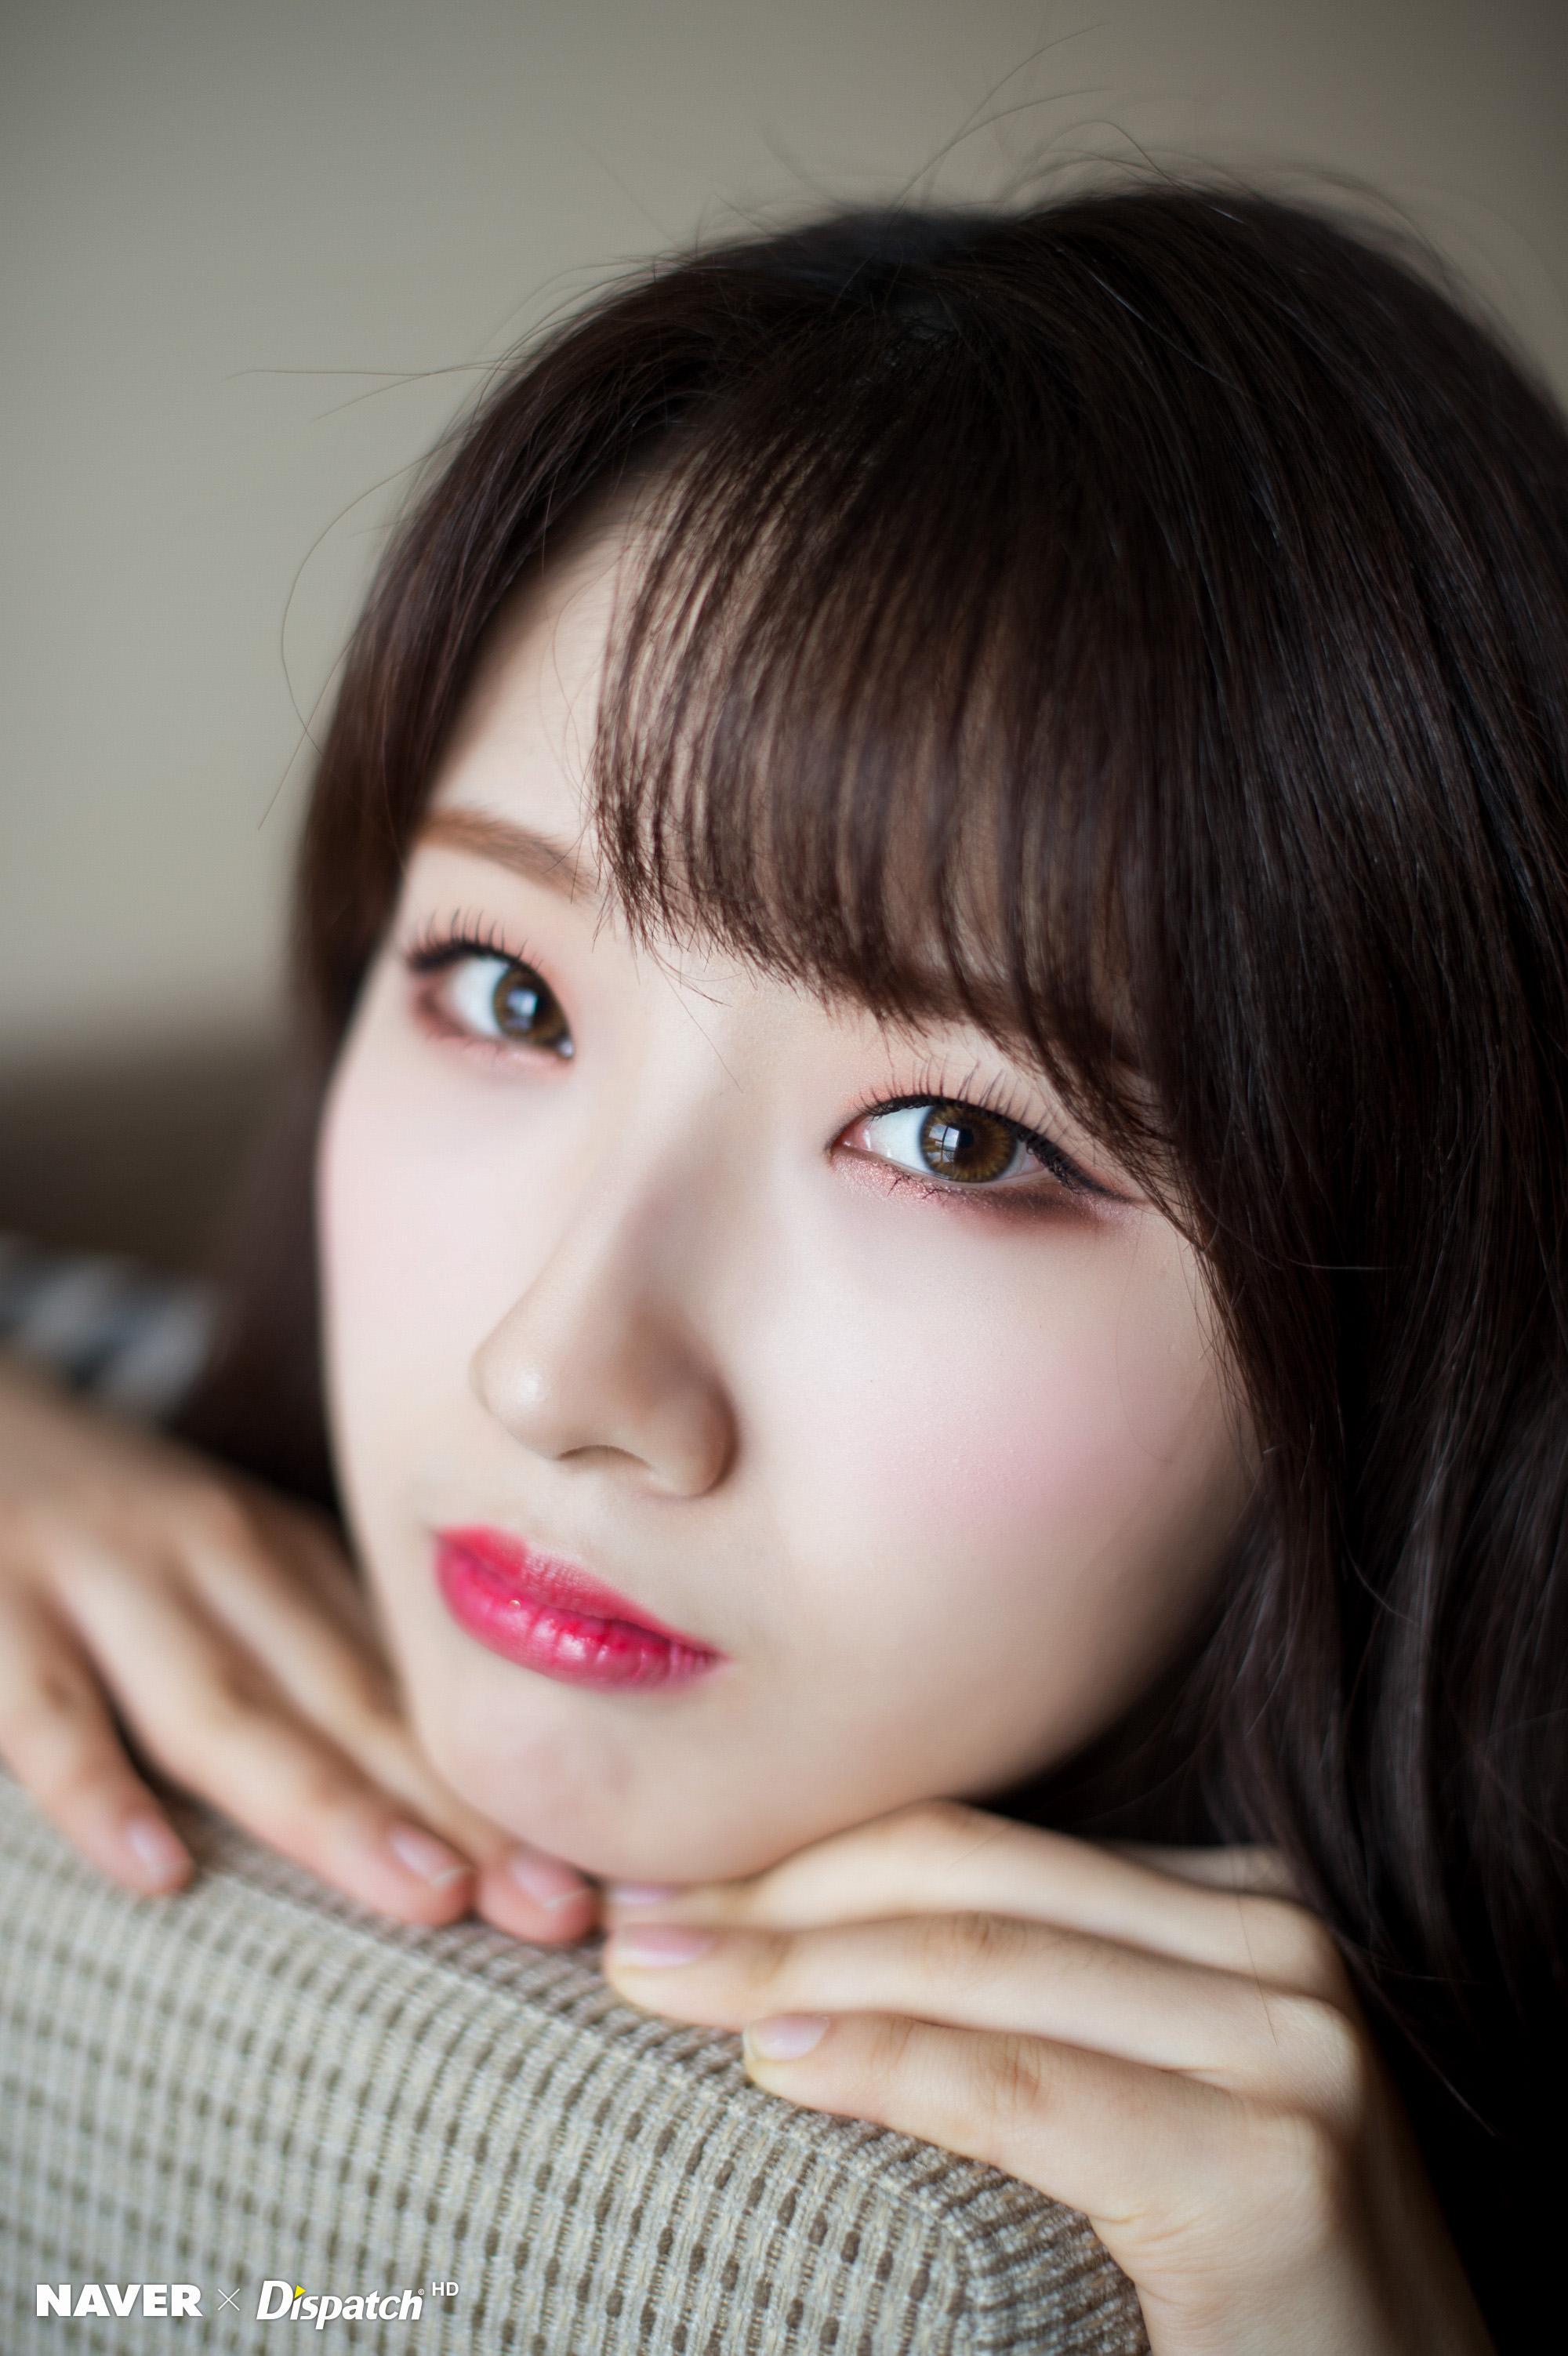 HaSeul NaverxDispatch August 2018 4.jpg